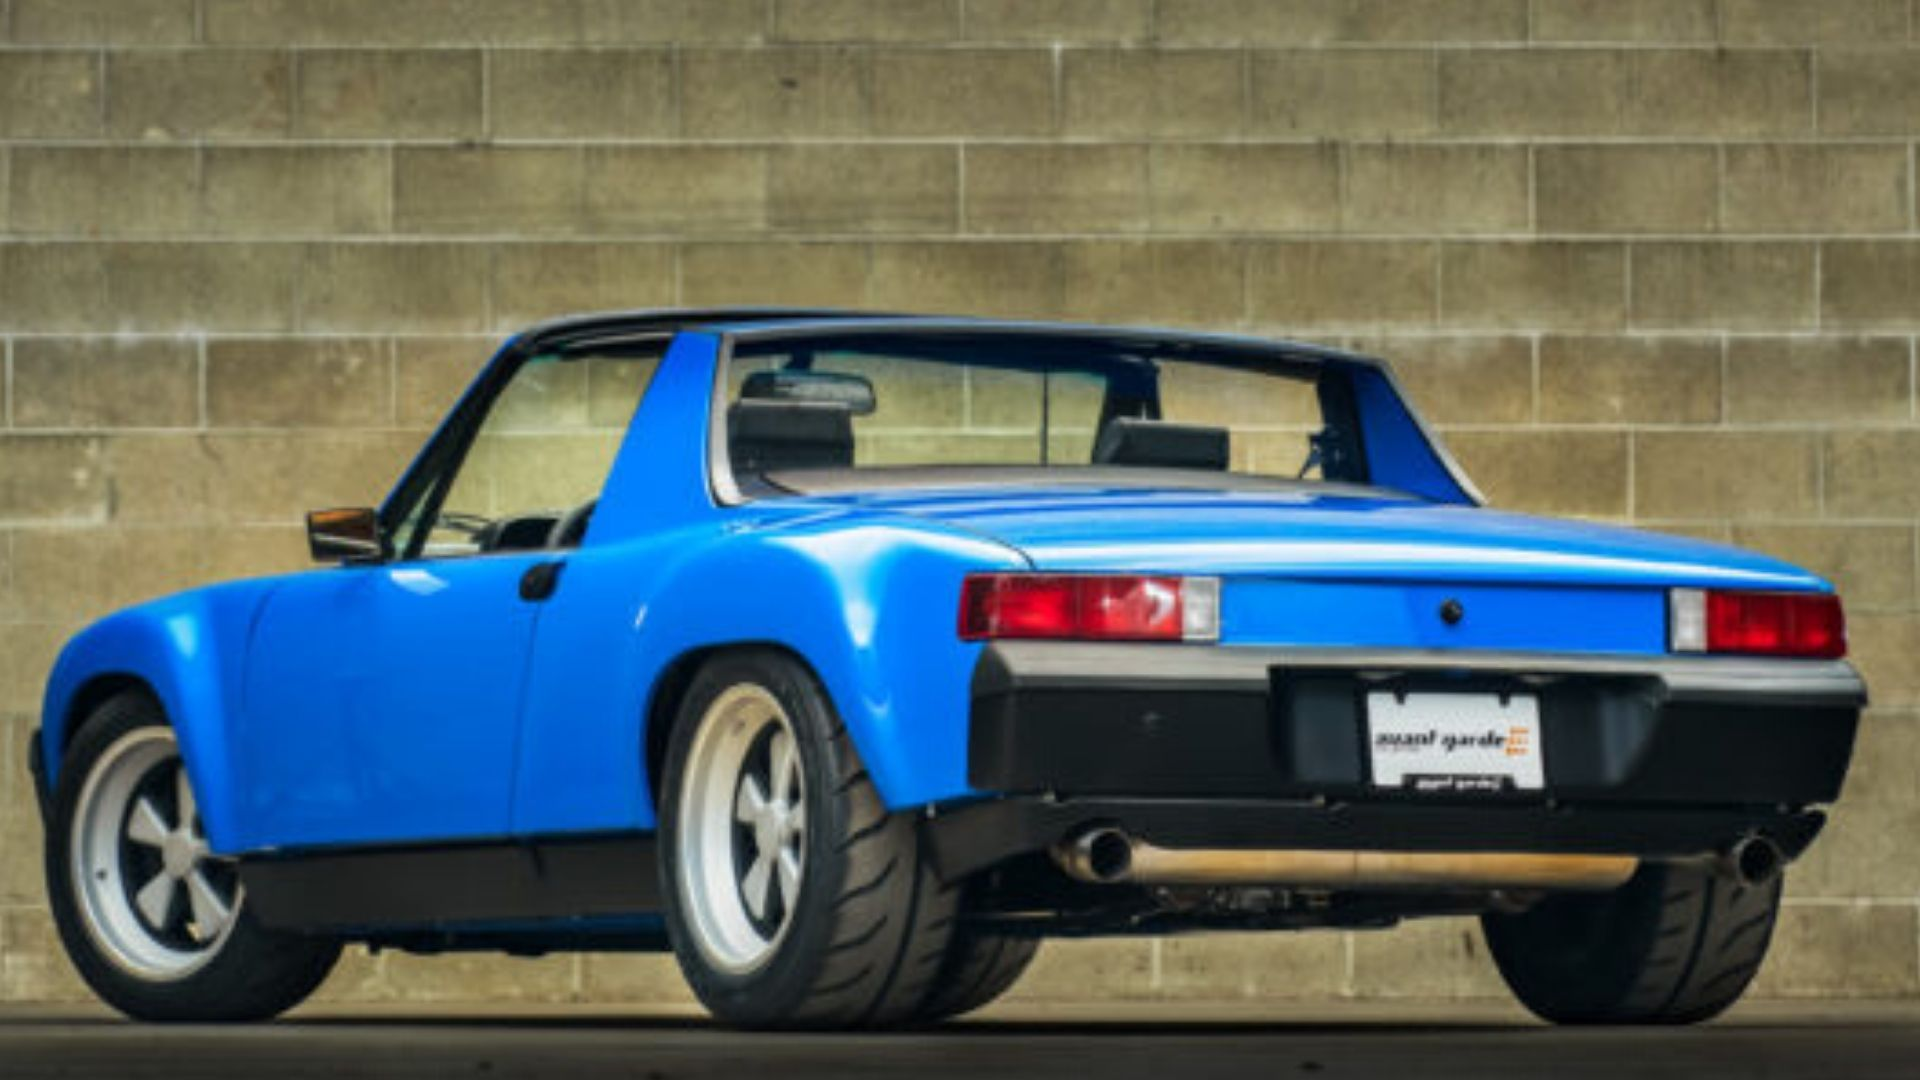 Get Your Kicks In This 3.6-Liter 1972 Porsche 914 Track Missile